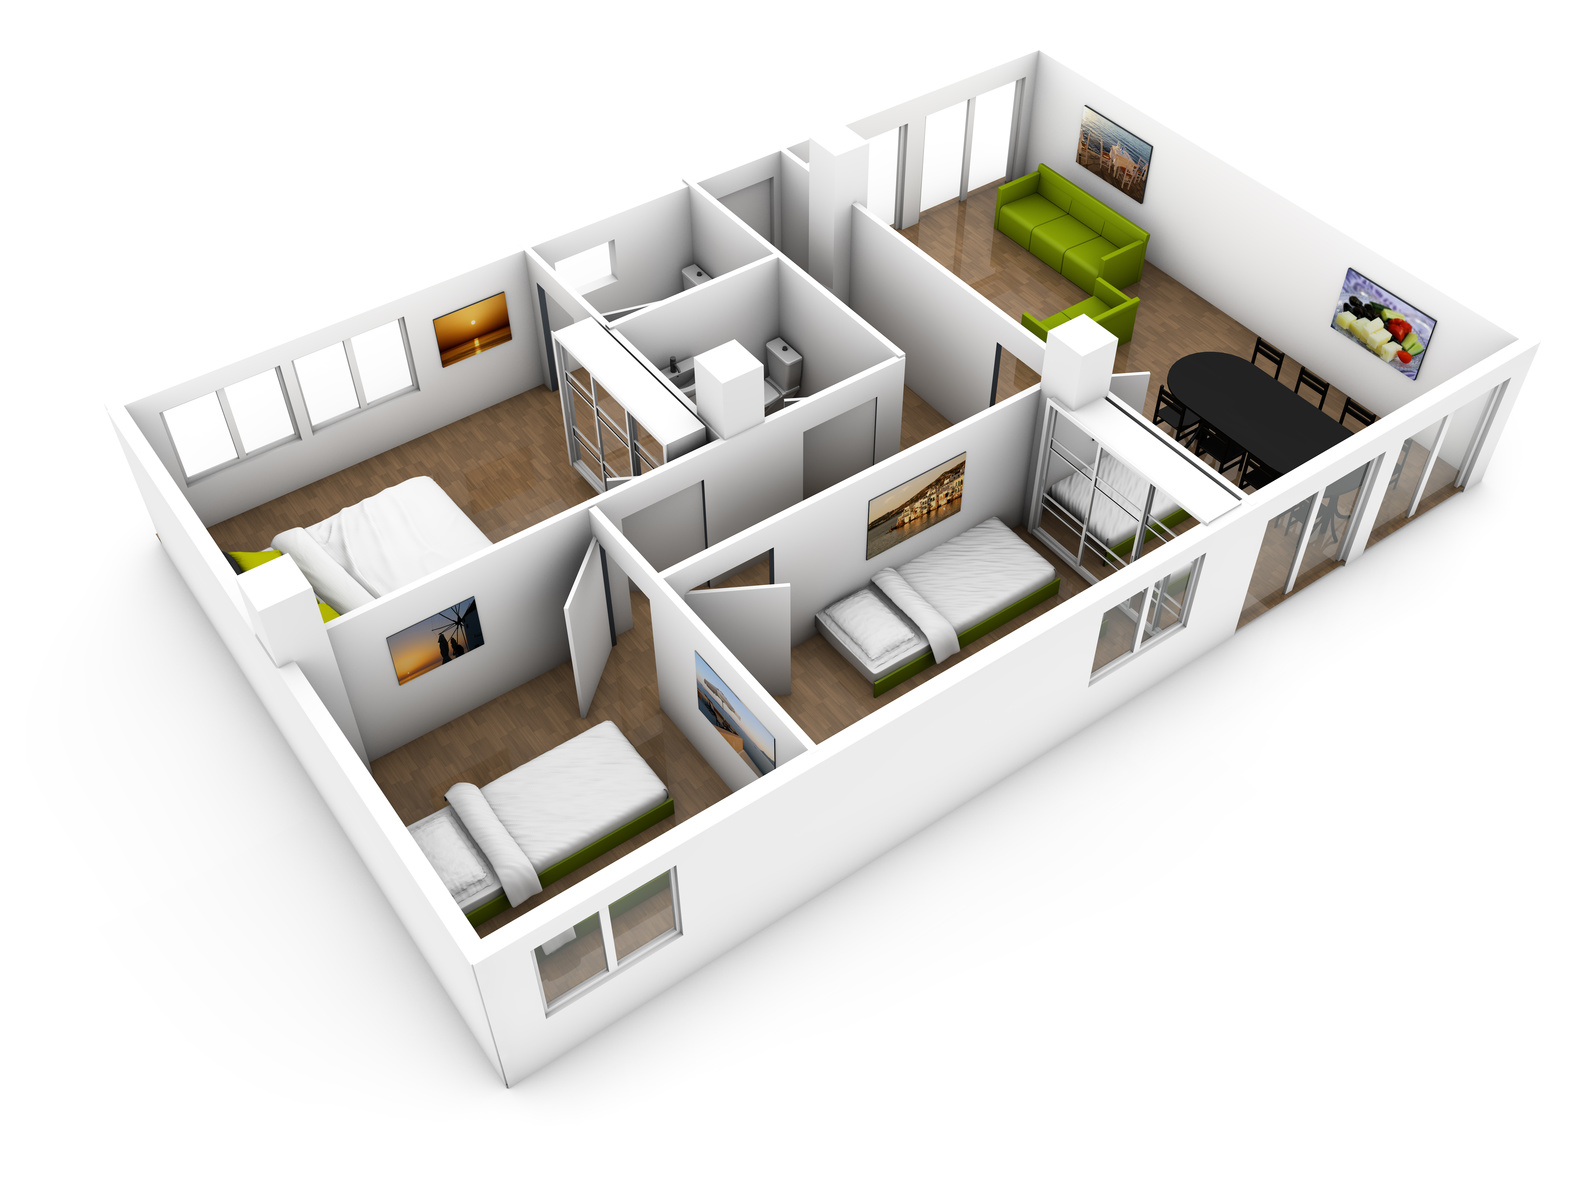 Rooms returned to their original intent for Santa Clarita virtual tour photography